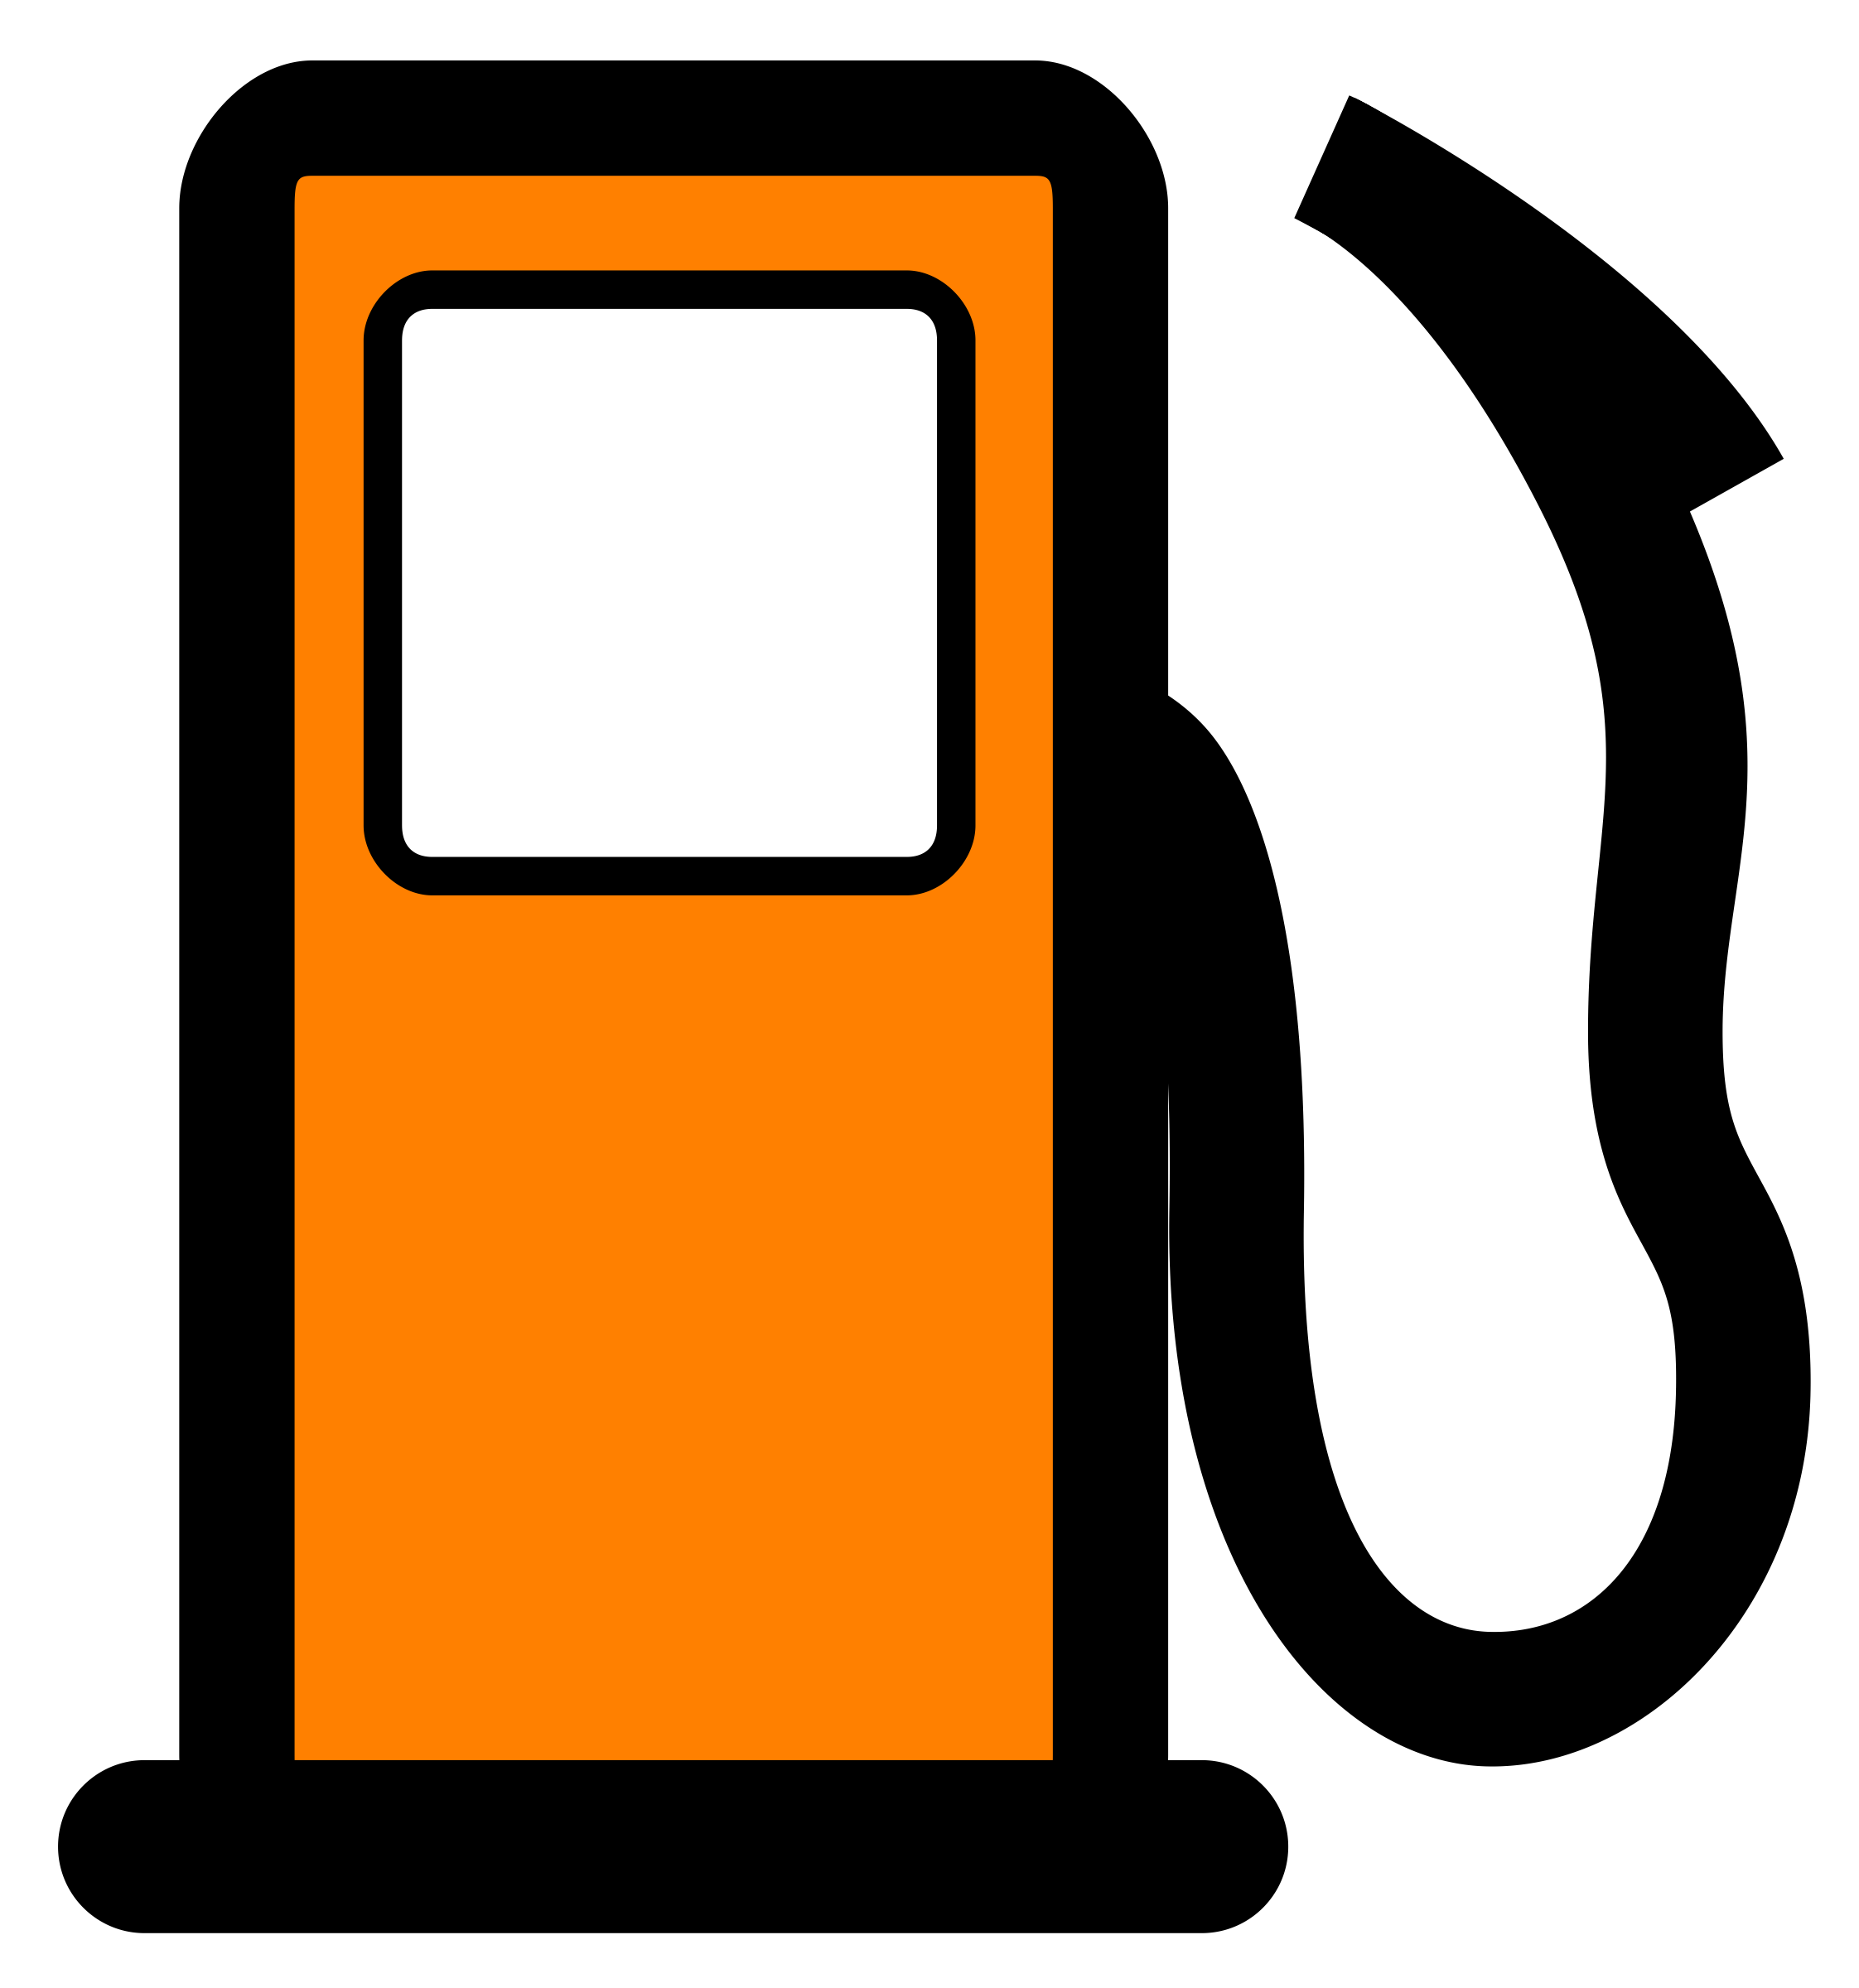 Cartoon gas station clipart vector free stock Gas Pump Clip Art - Gas Clipart , Transparent Cartoon - Jing.fm vector free stock